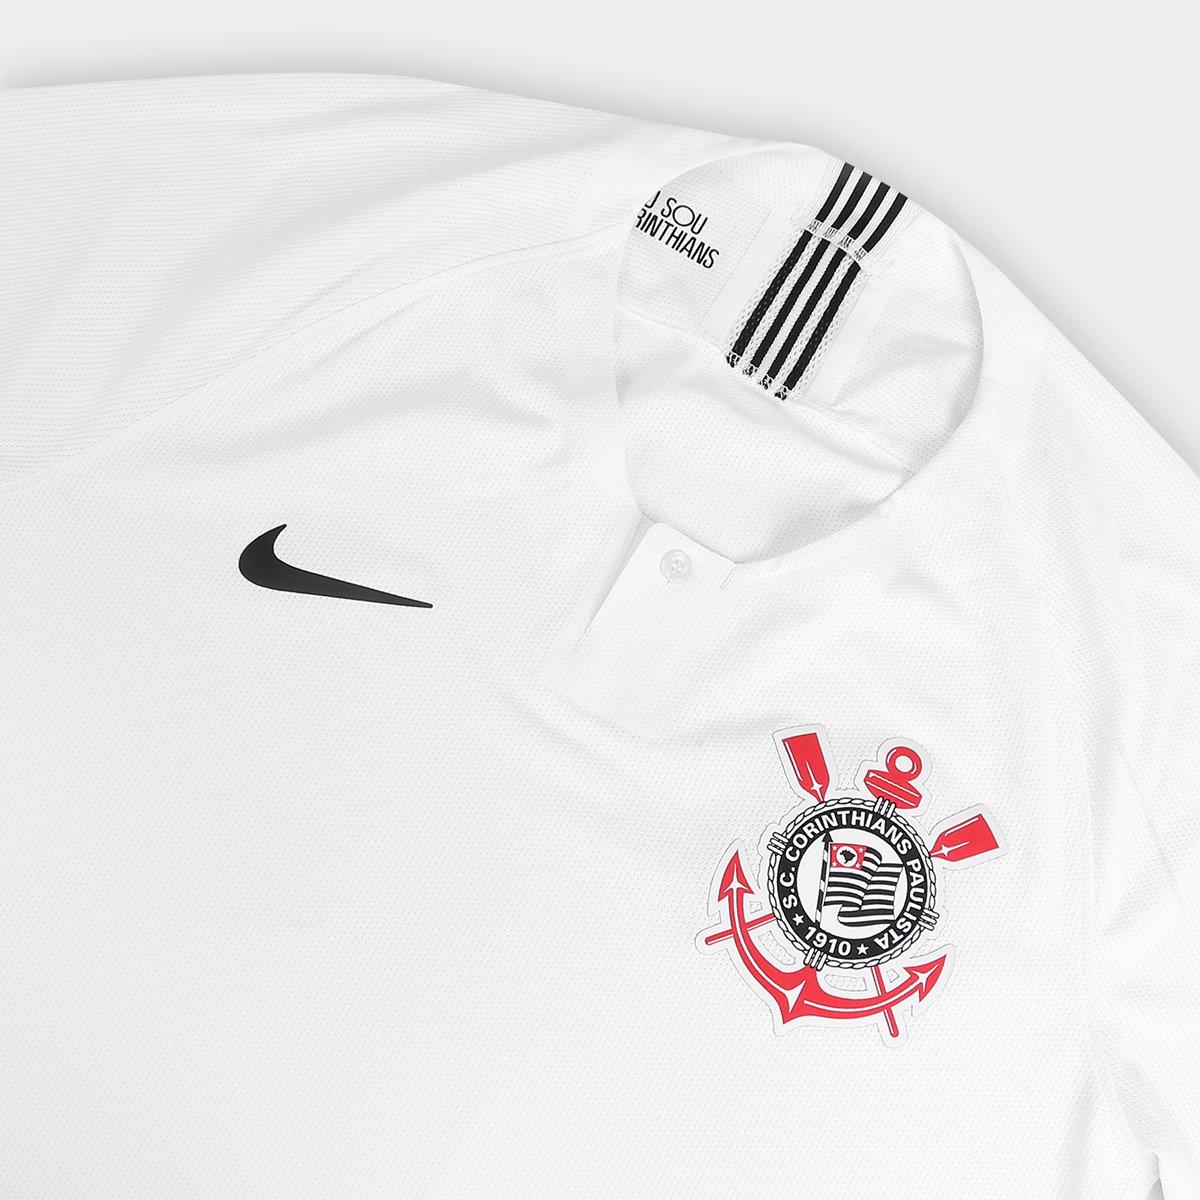 Camisa Corinthians I 2018 s n° - Jogador Nike Masculina - Branco e ... fcdc7991f3d63